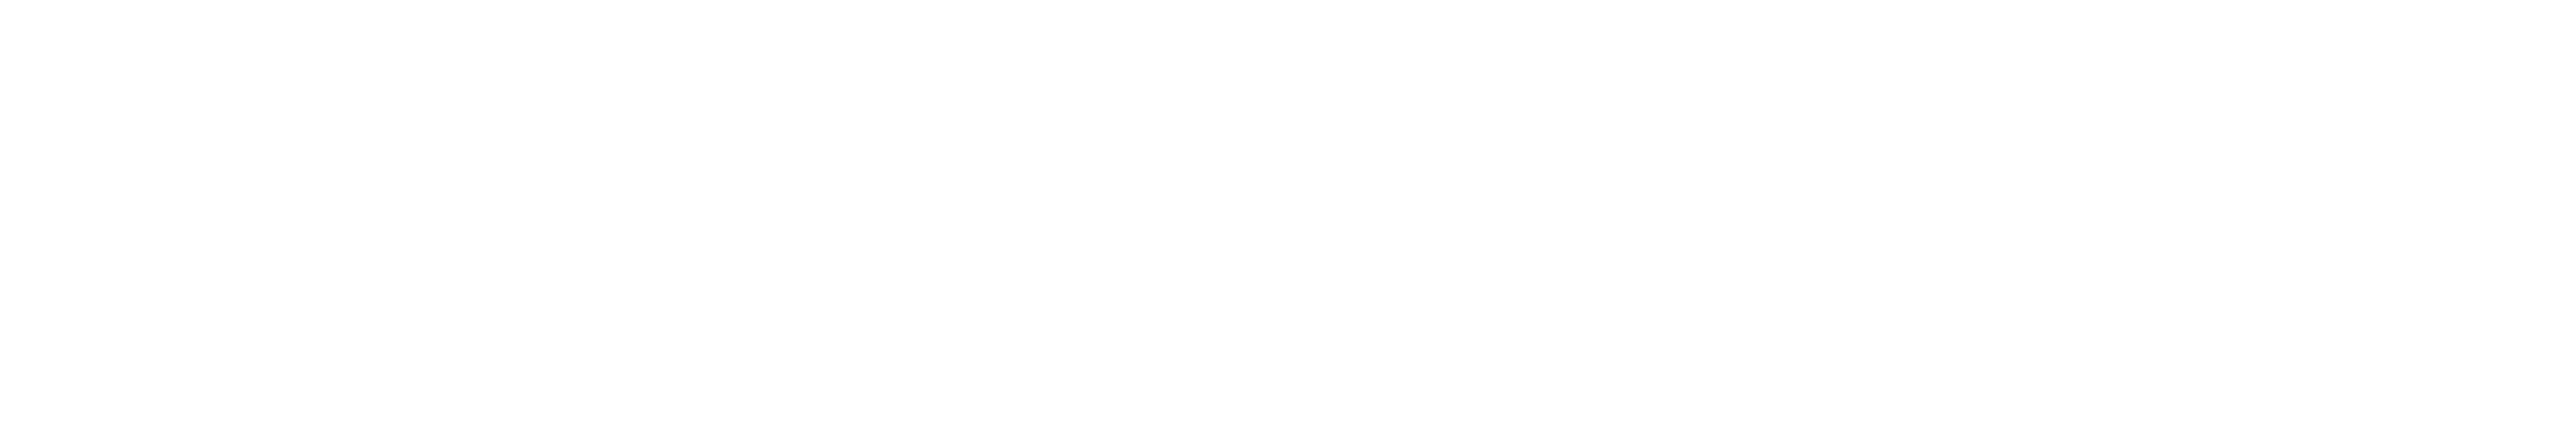 auxmoney Logo PNG Print RBG Weiss